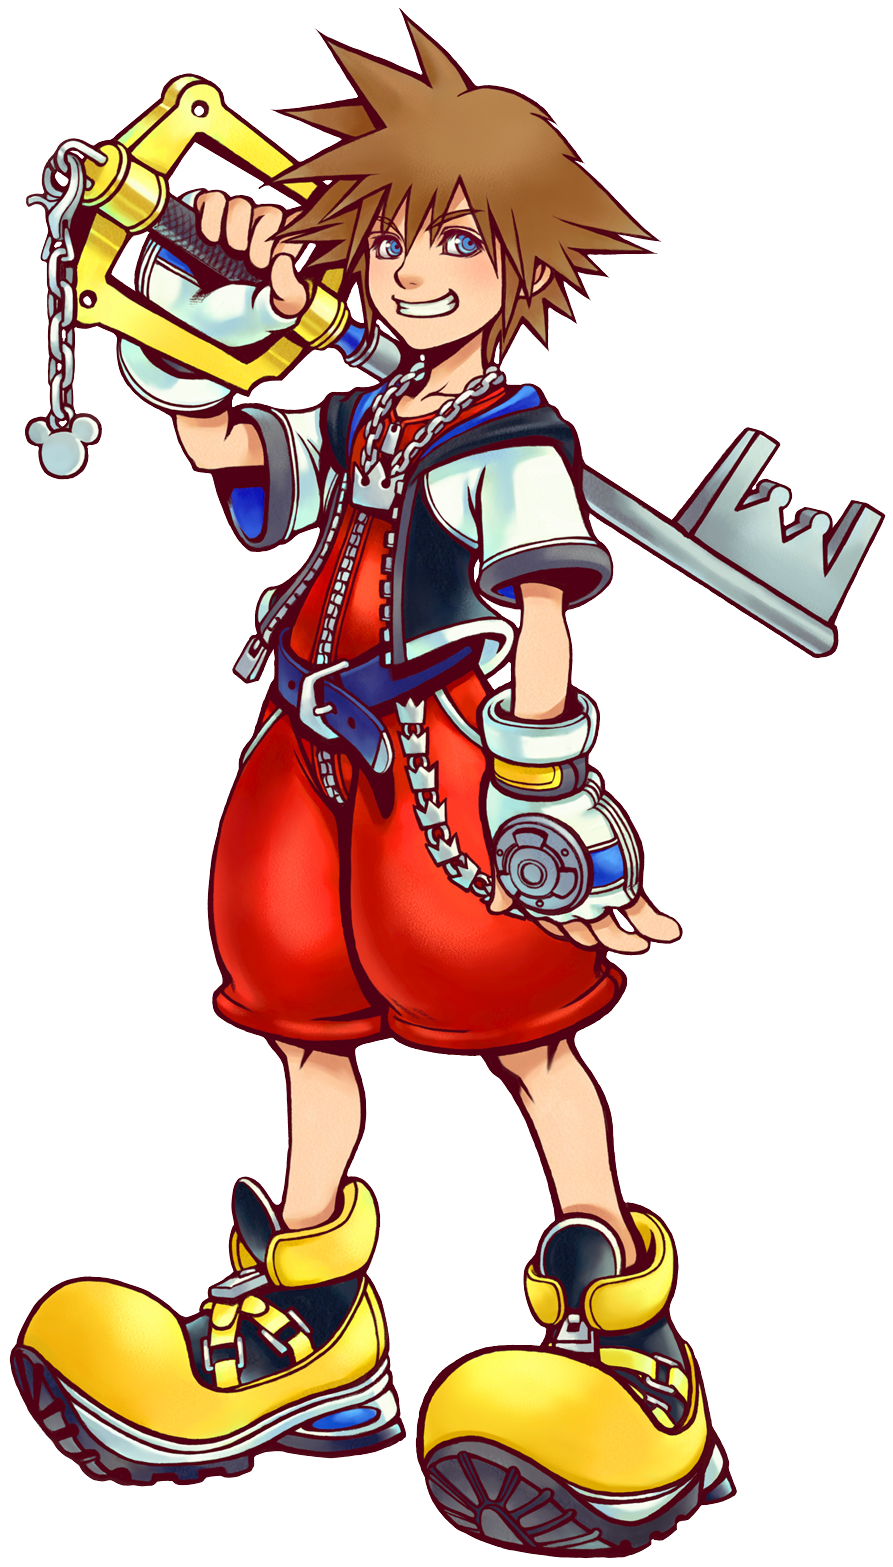 Sora Kingdom Hearts Lineart : Sora art kh